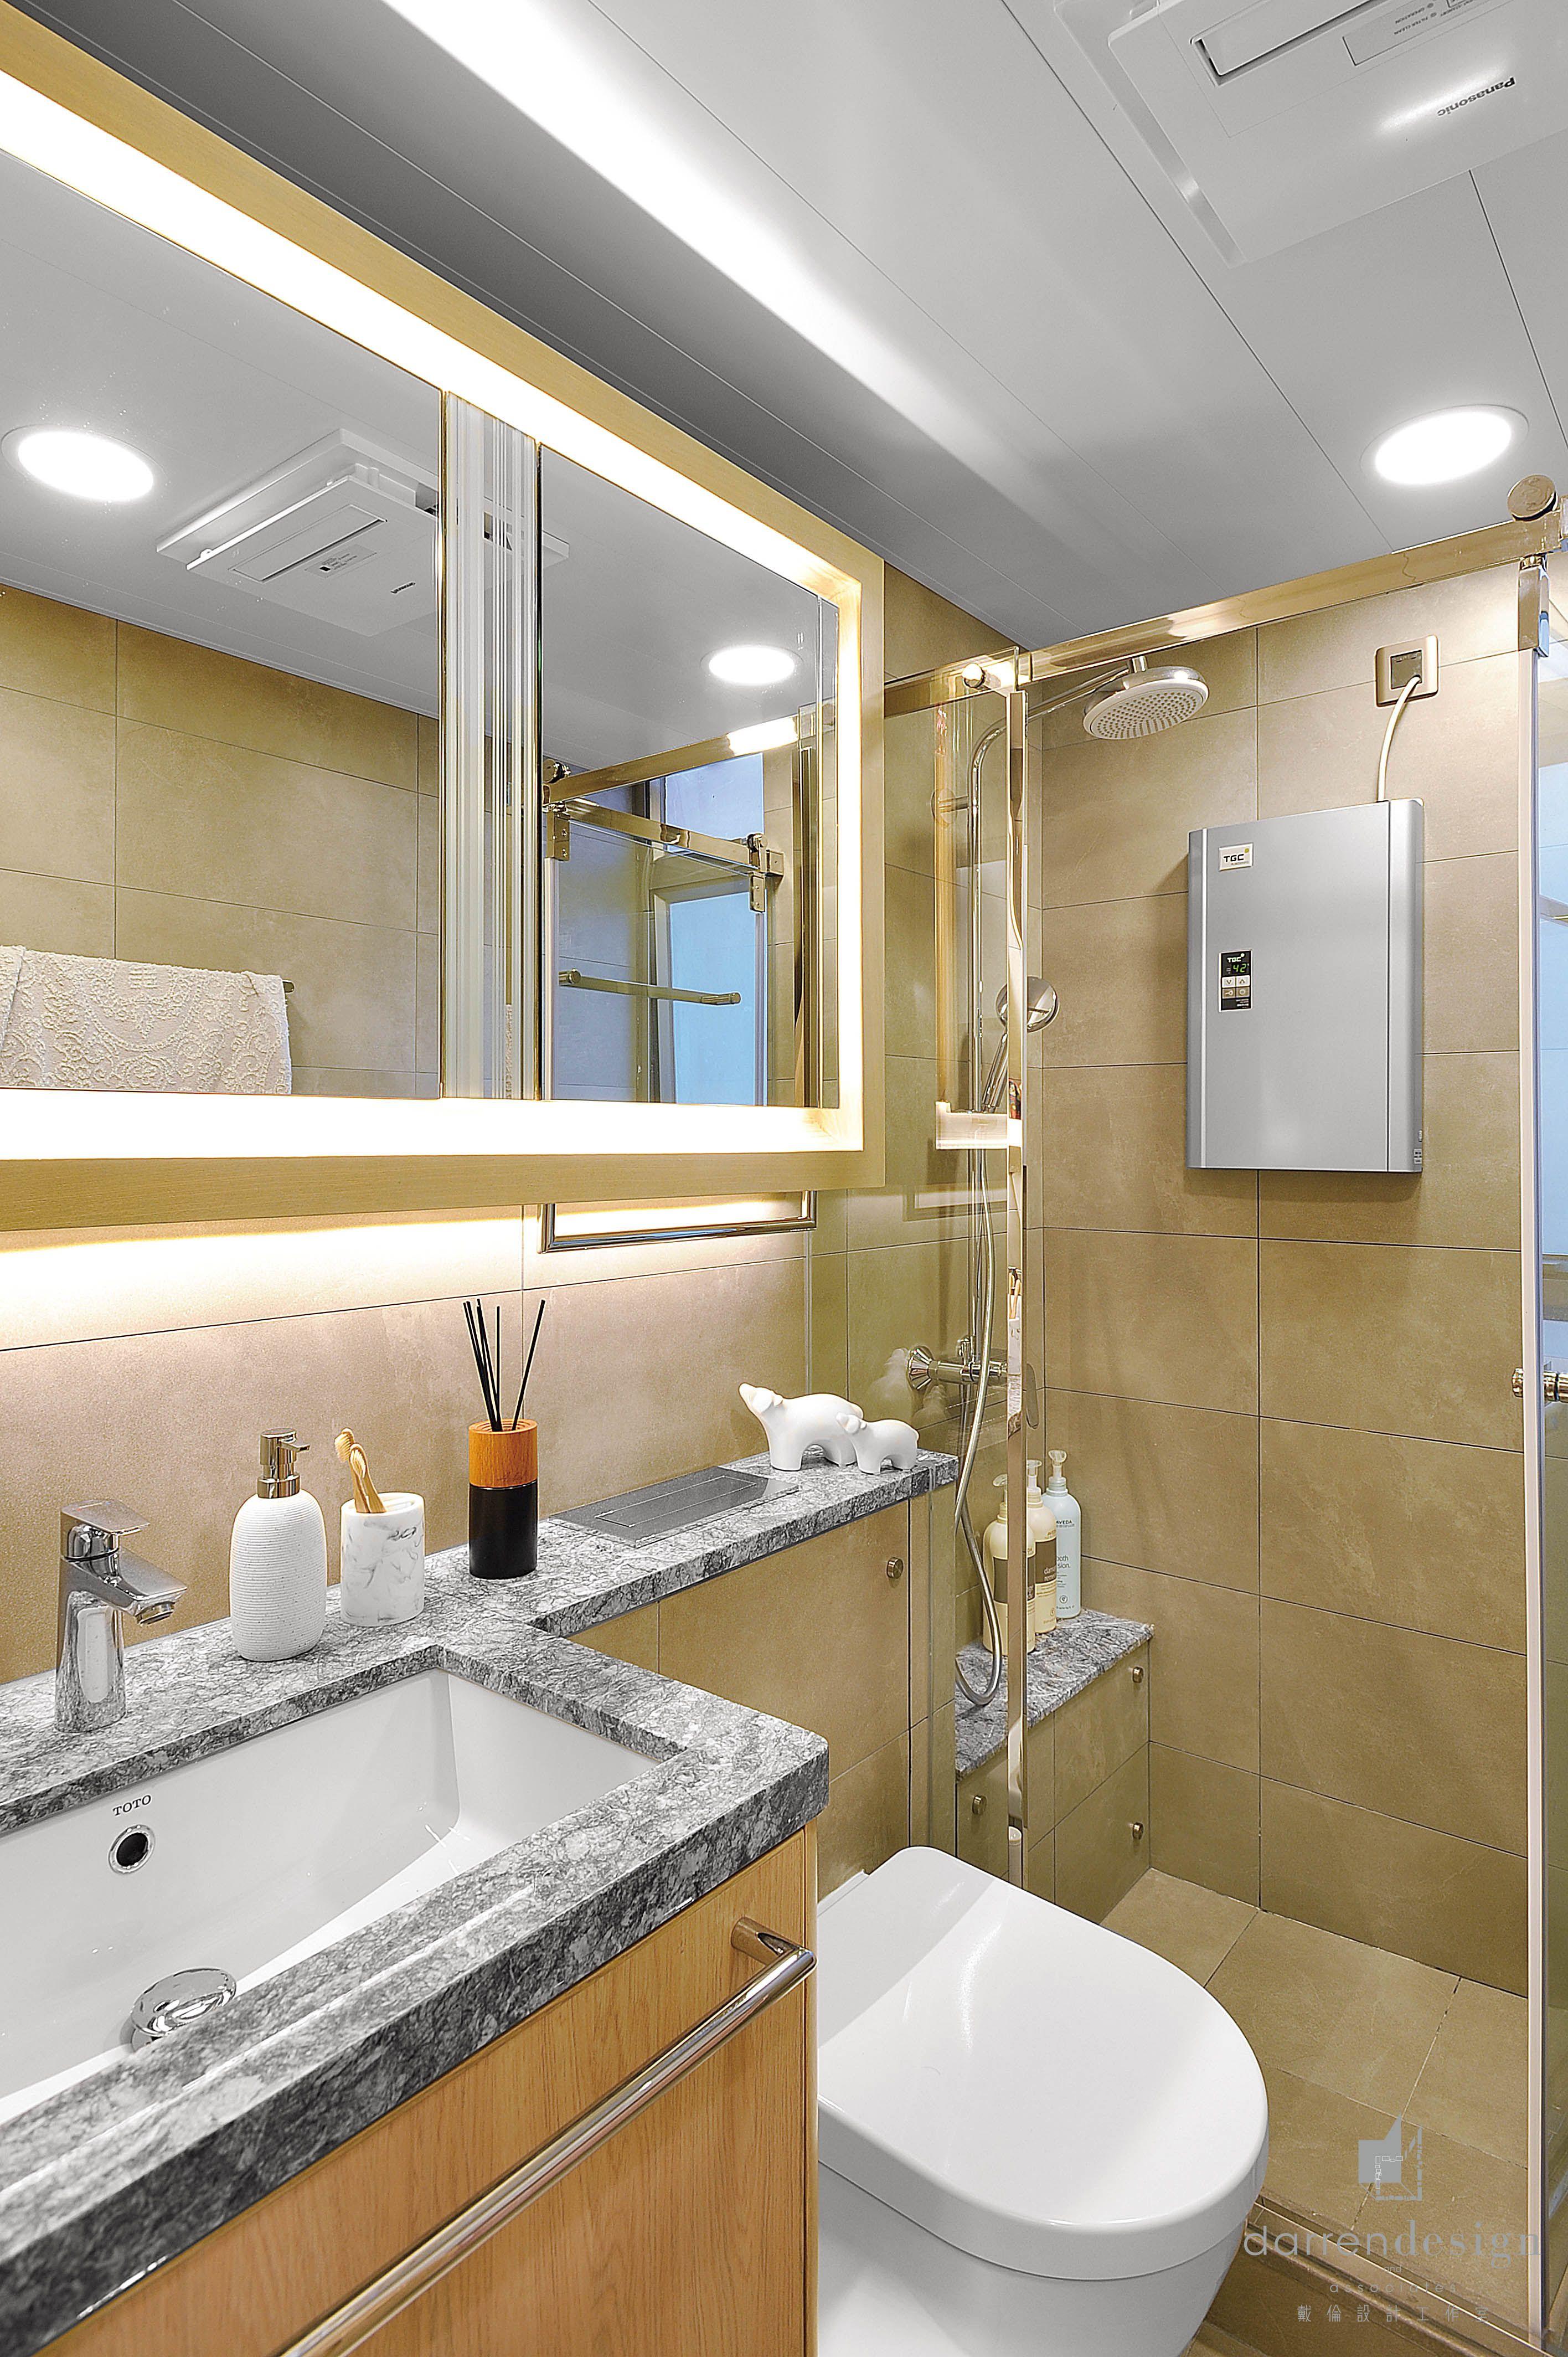 A Recent Luxurious Home Project By Hong Kong Designer Darren Interior Design. Visit Www.dda